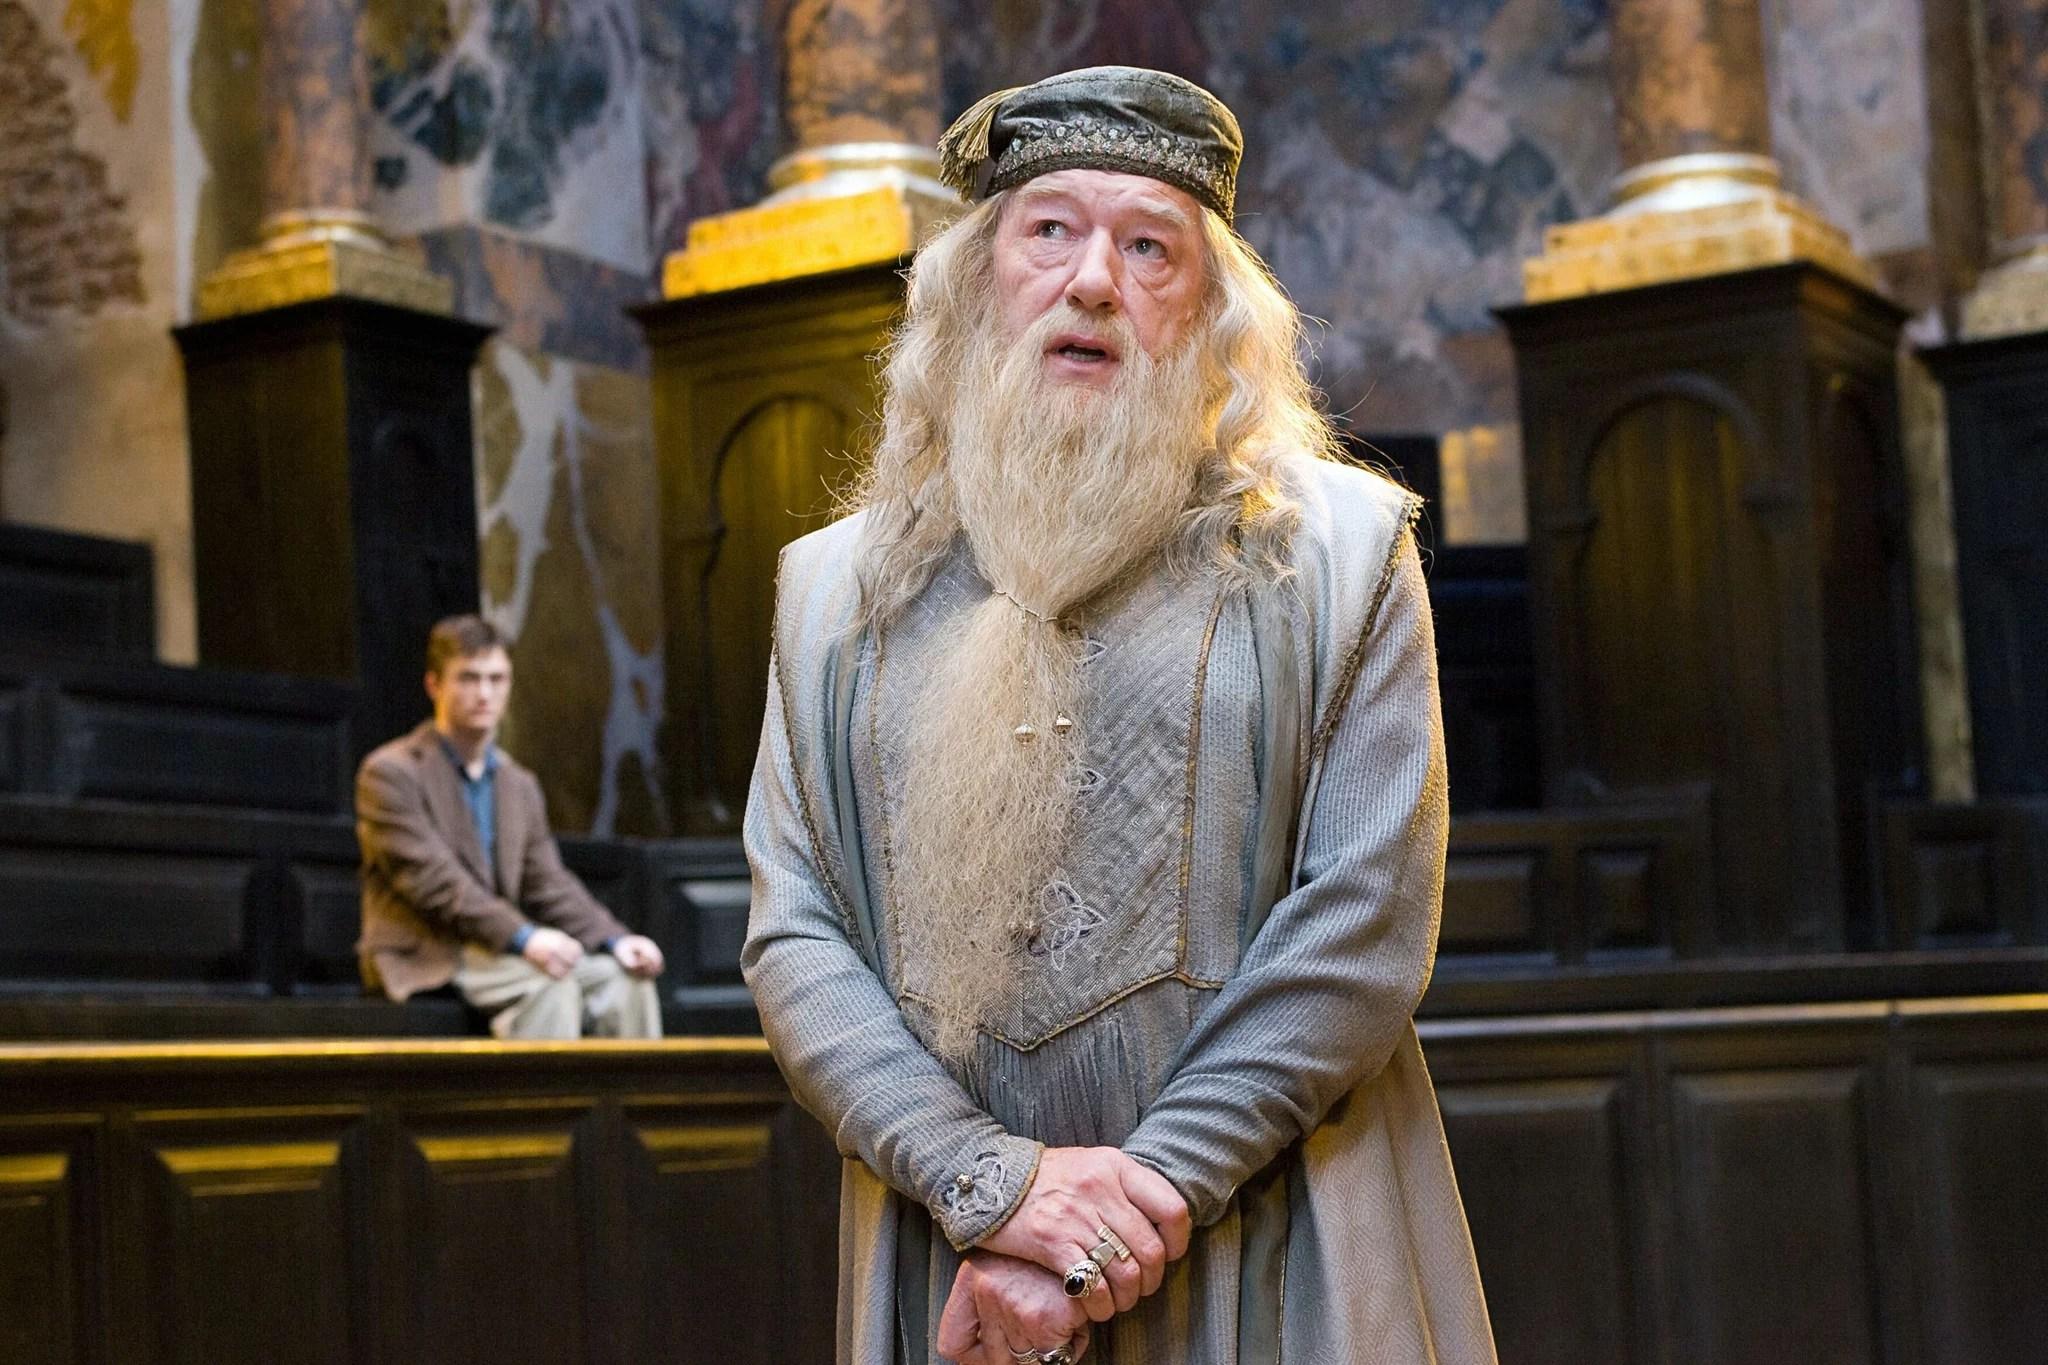 How Does Albus Dumbledore Know Newt Scamander